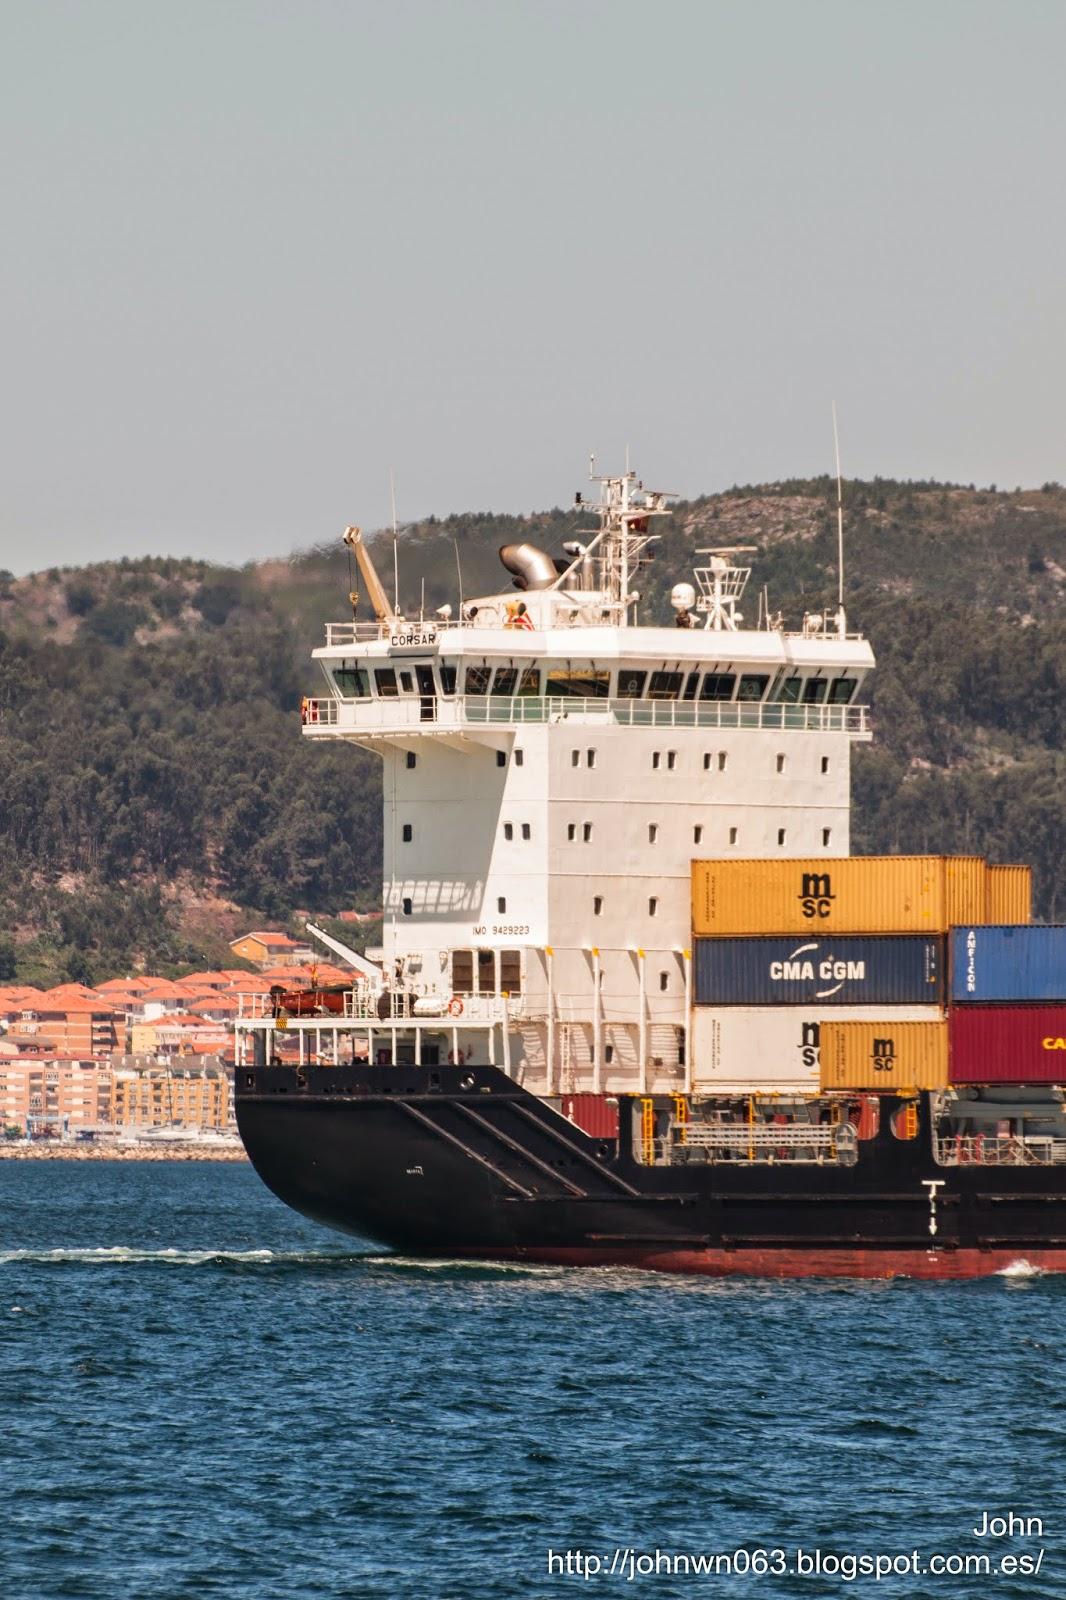 fotos de barcos, imagenes de barcos, corsair, containero, container ship, vigo